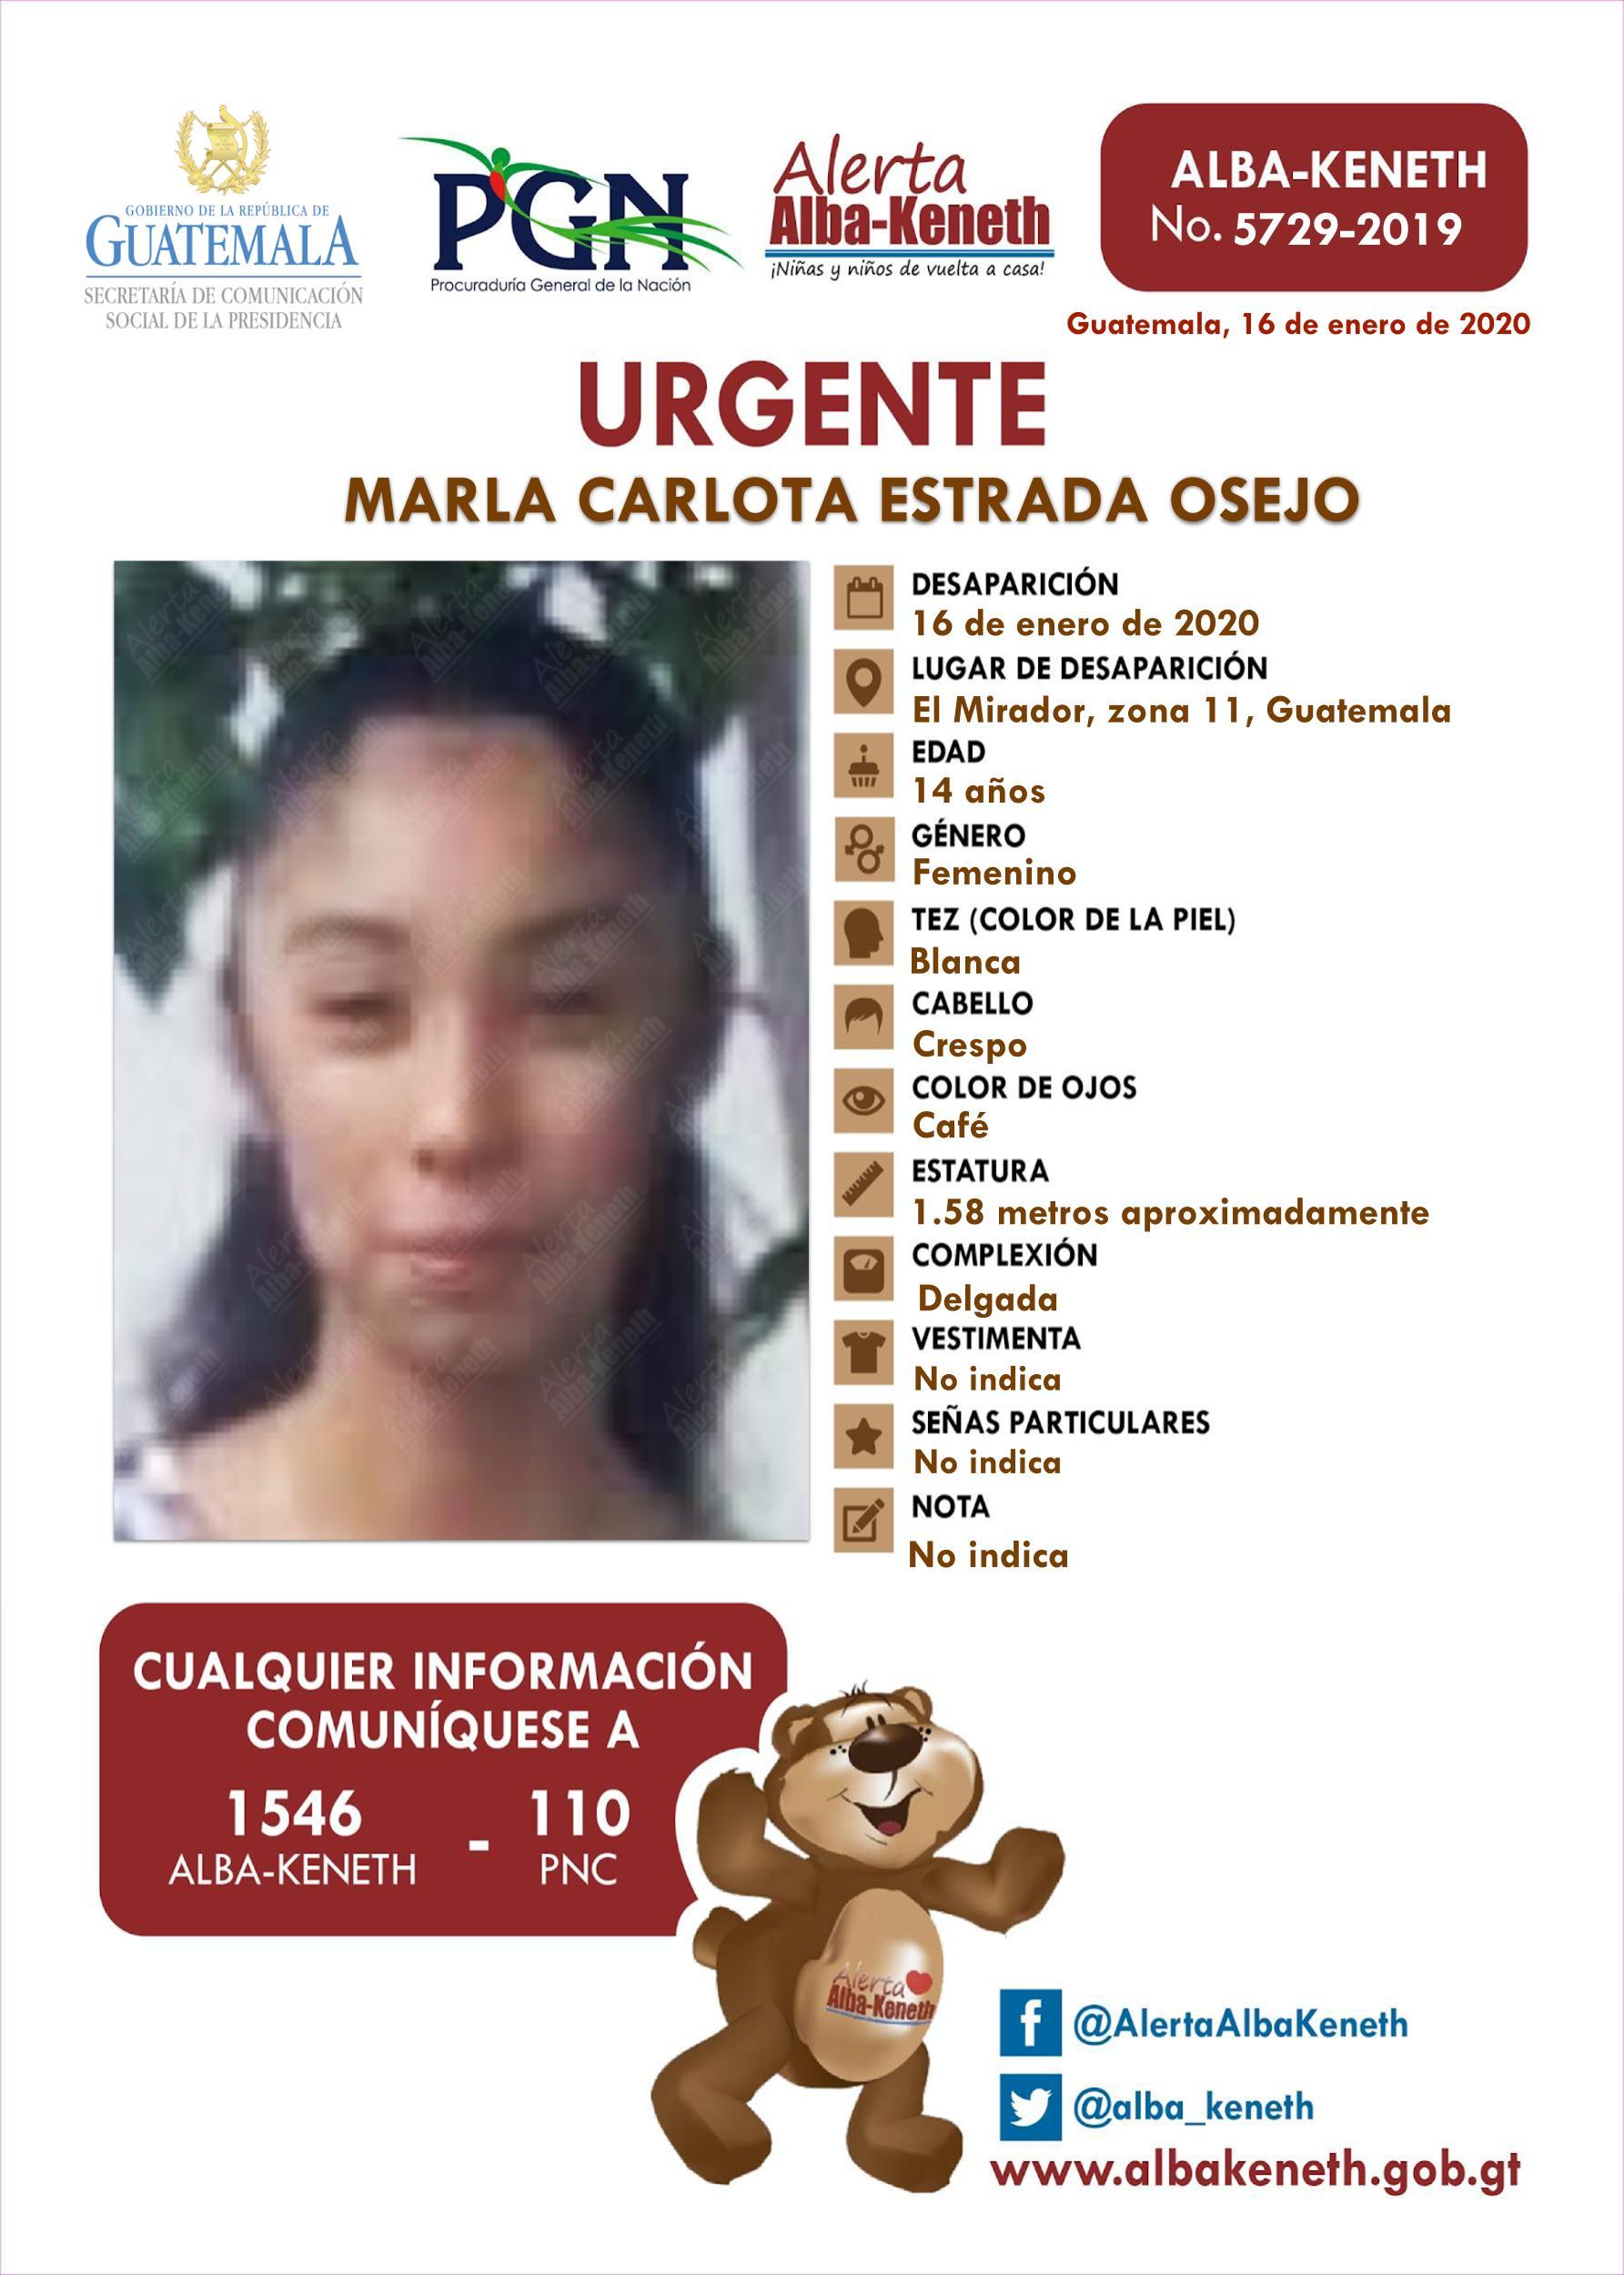 Marla Carlota Estrada Osejo